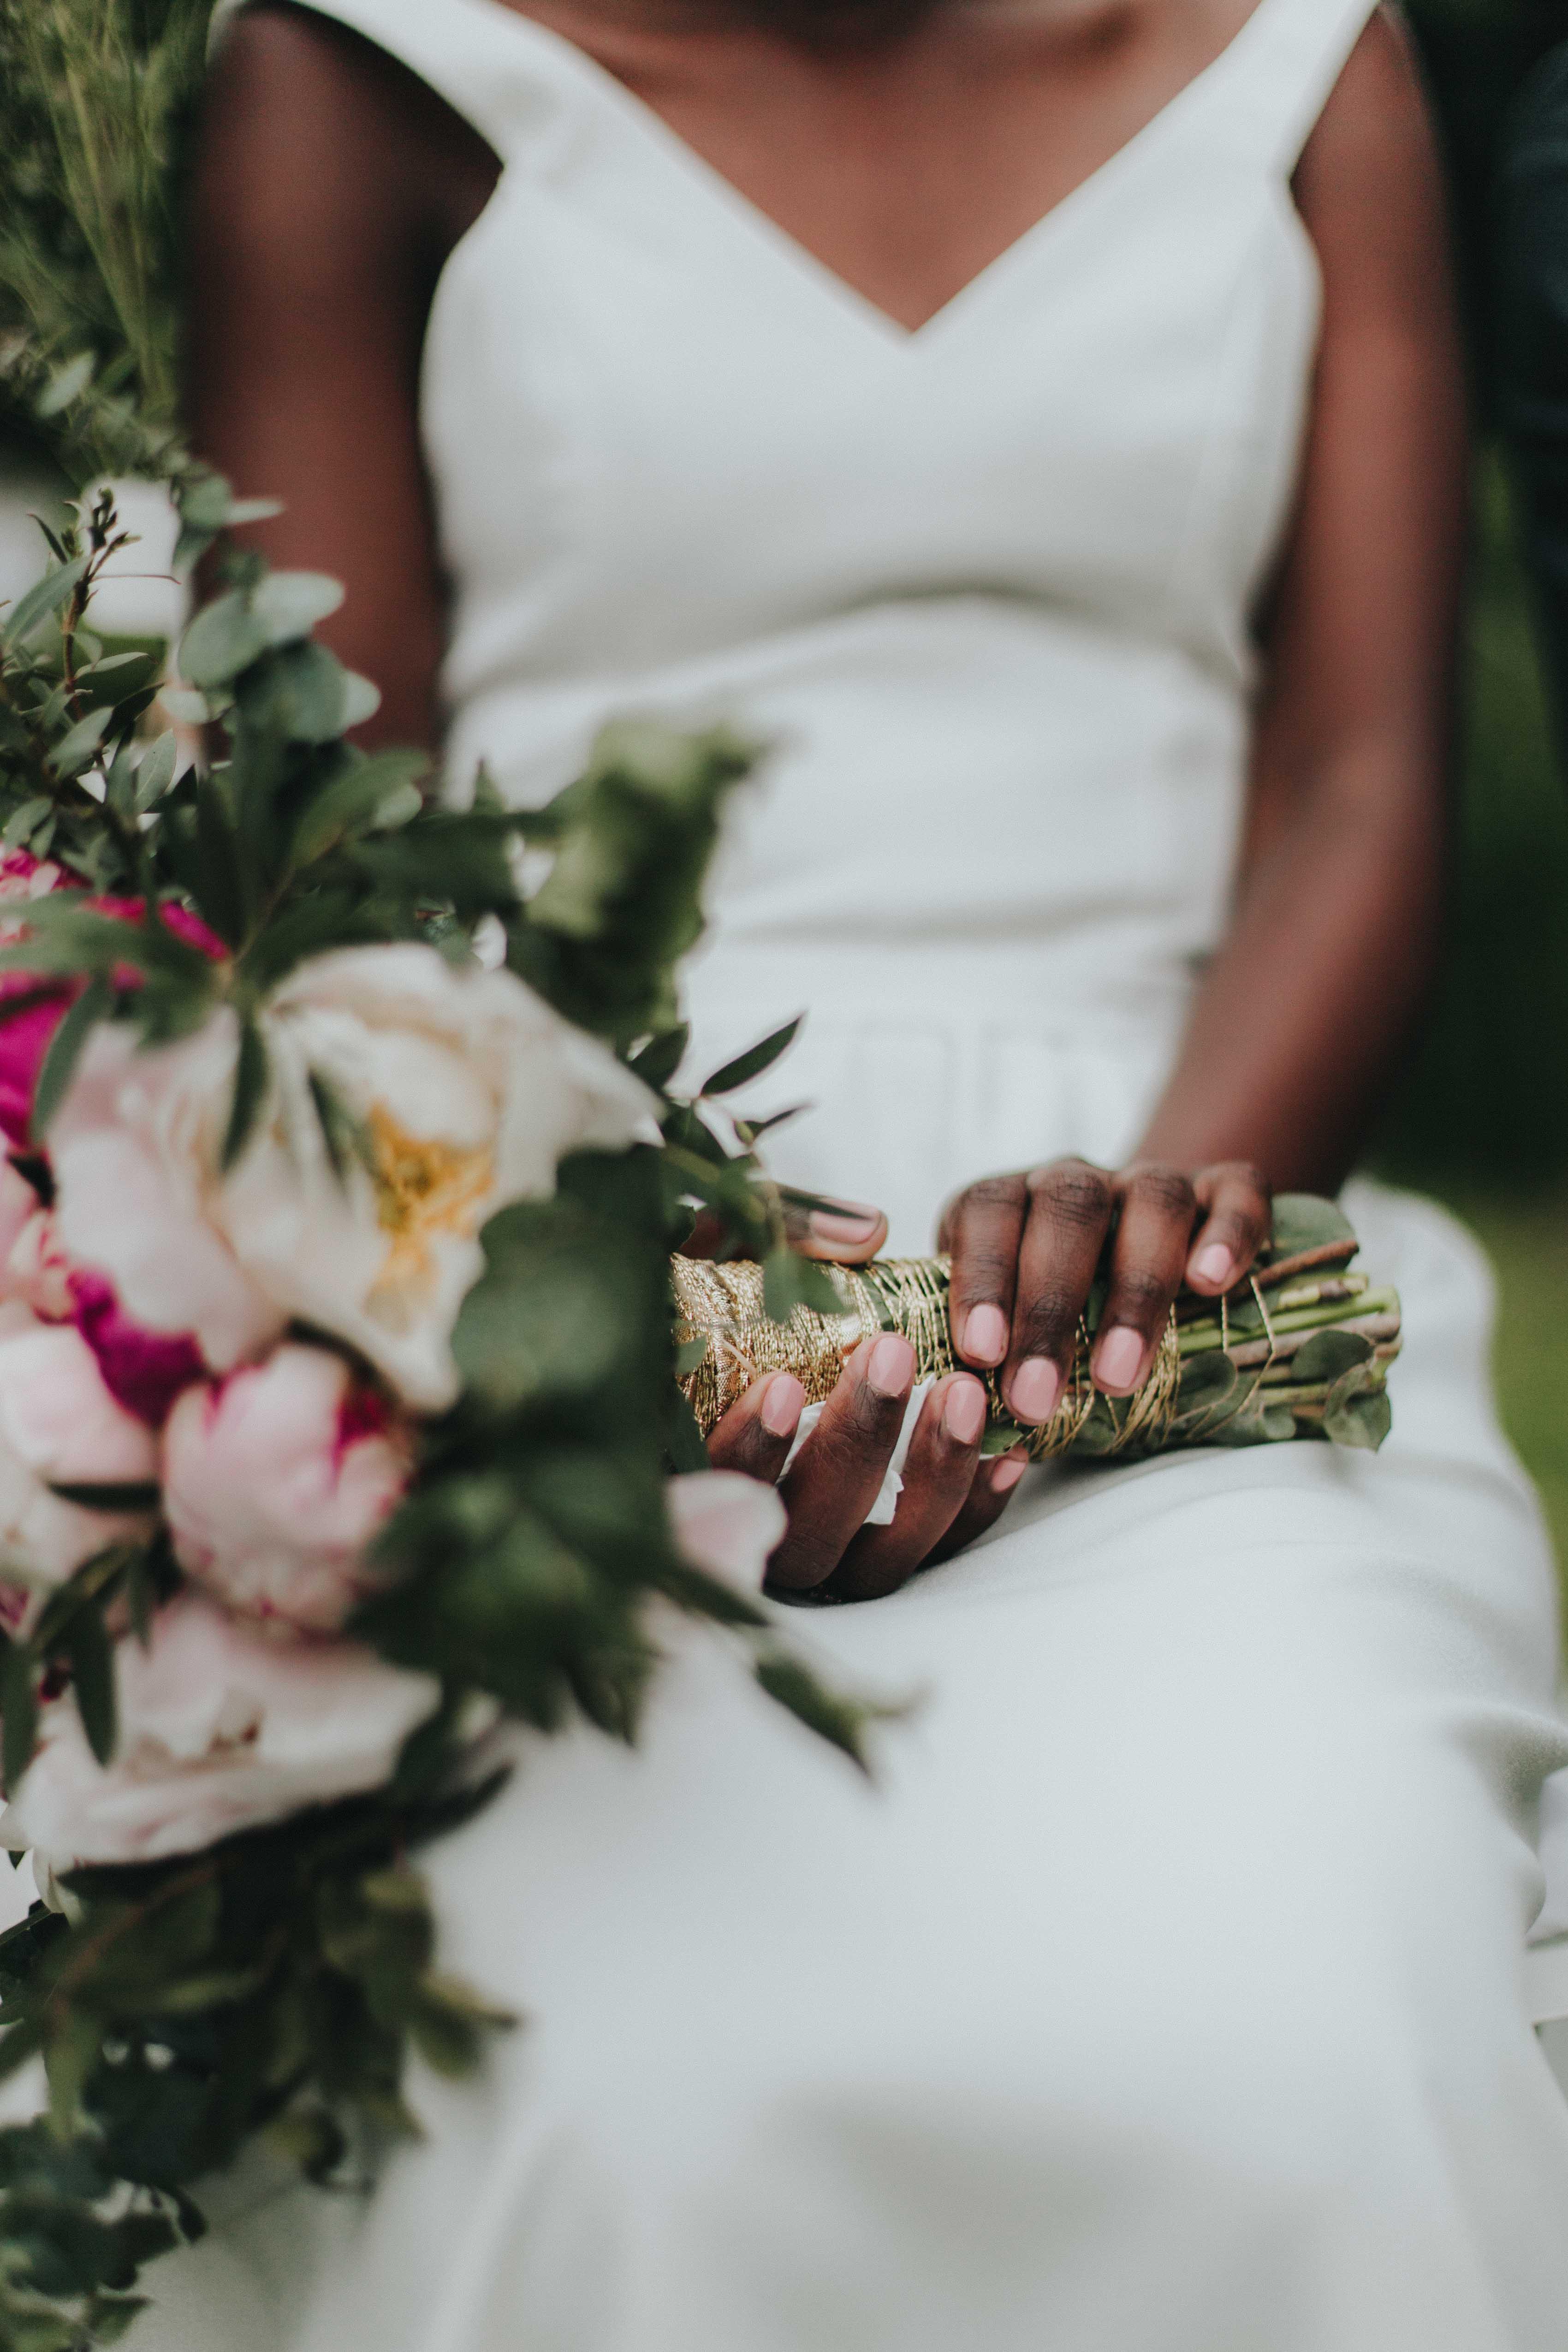 FANNY_MYARD_PHOTOGRAPHY_MARIAGE-53